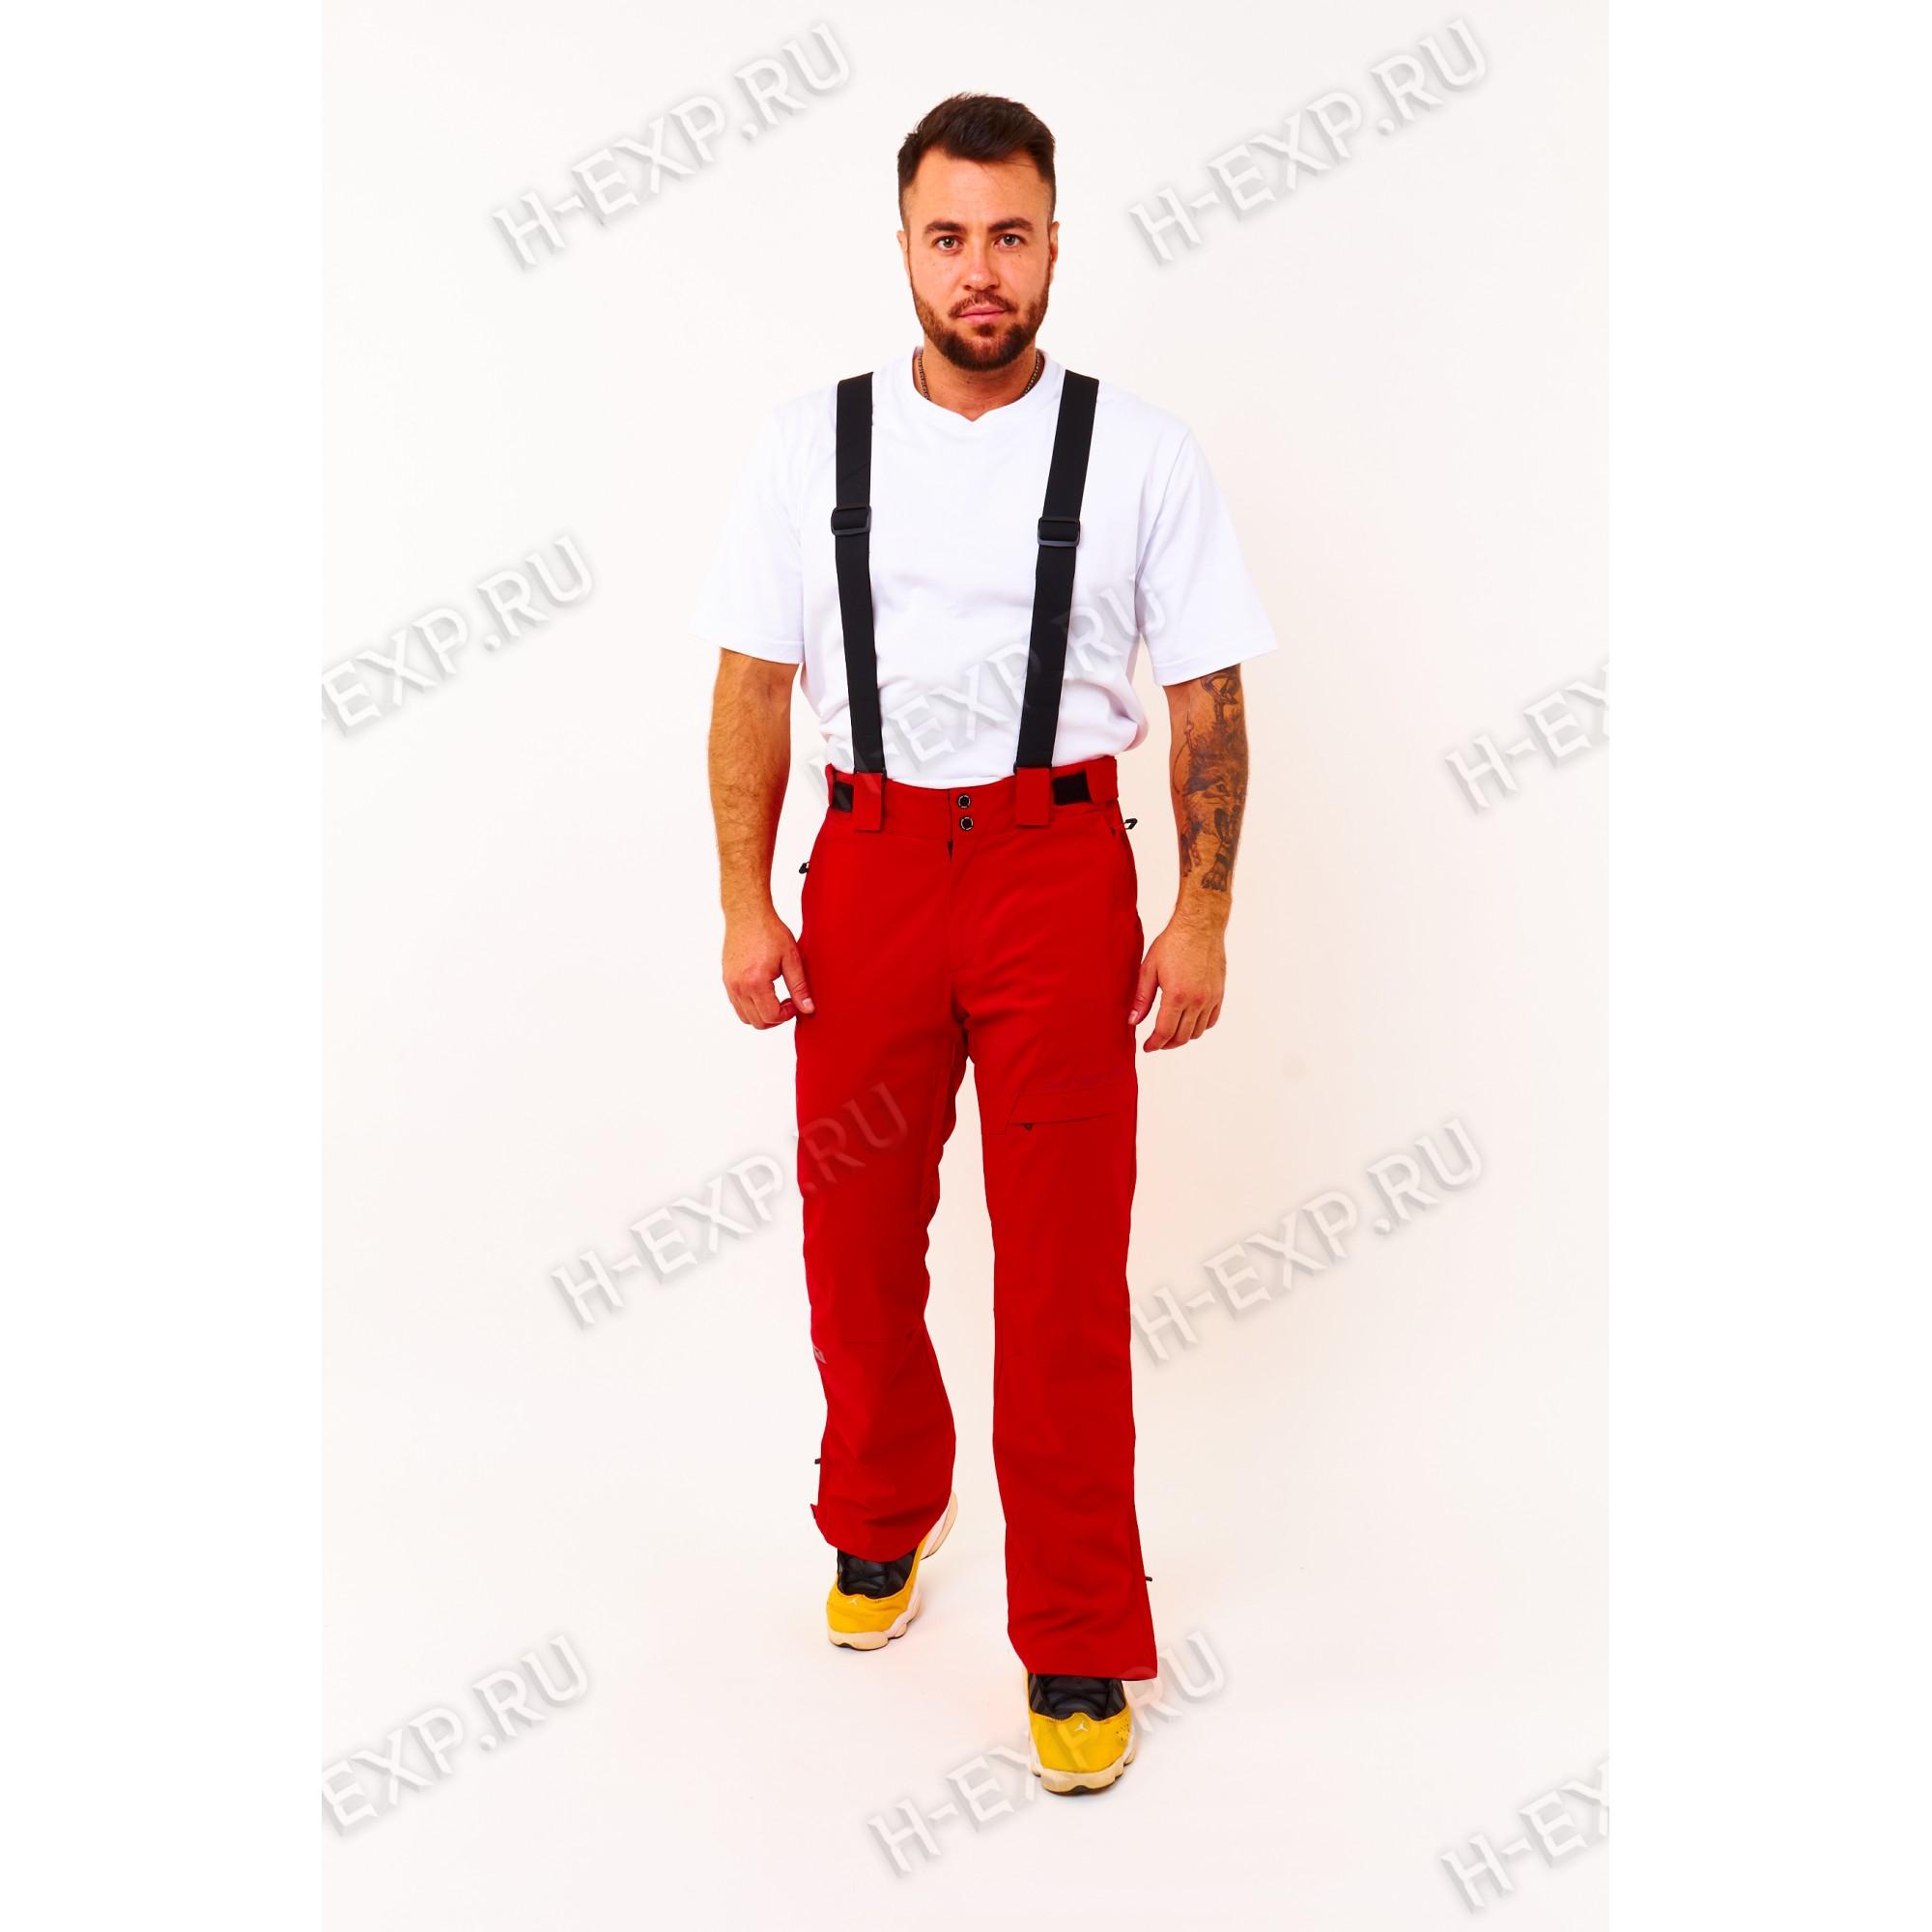 Штаны горнолыжные мужские Tisent 521203 (R02) Красный